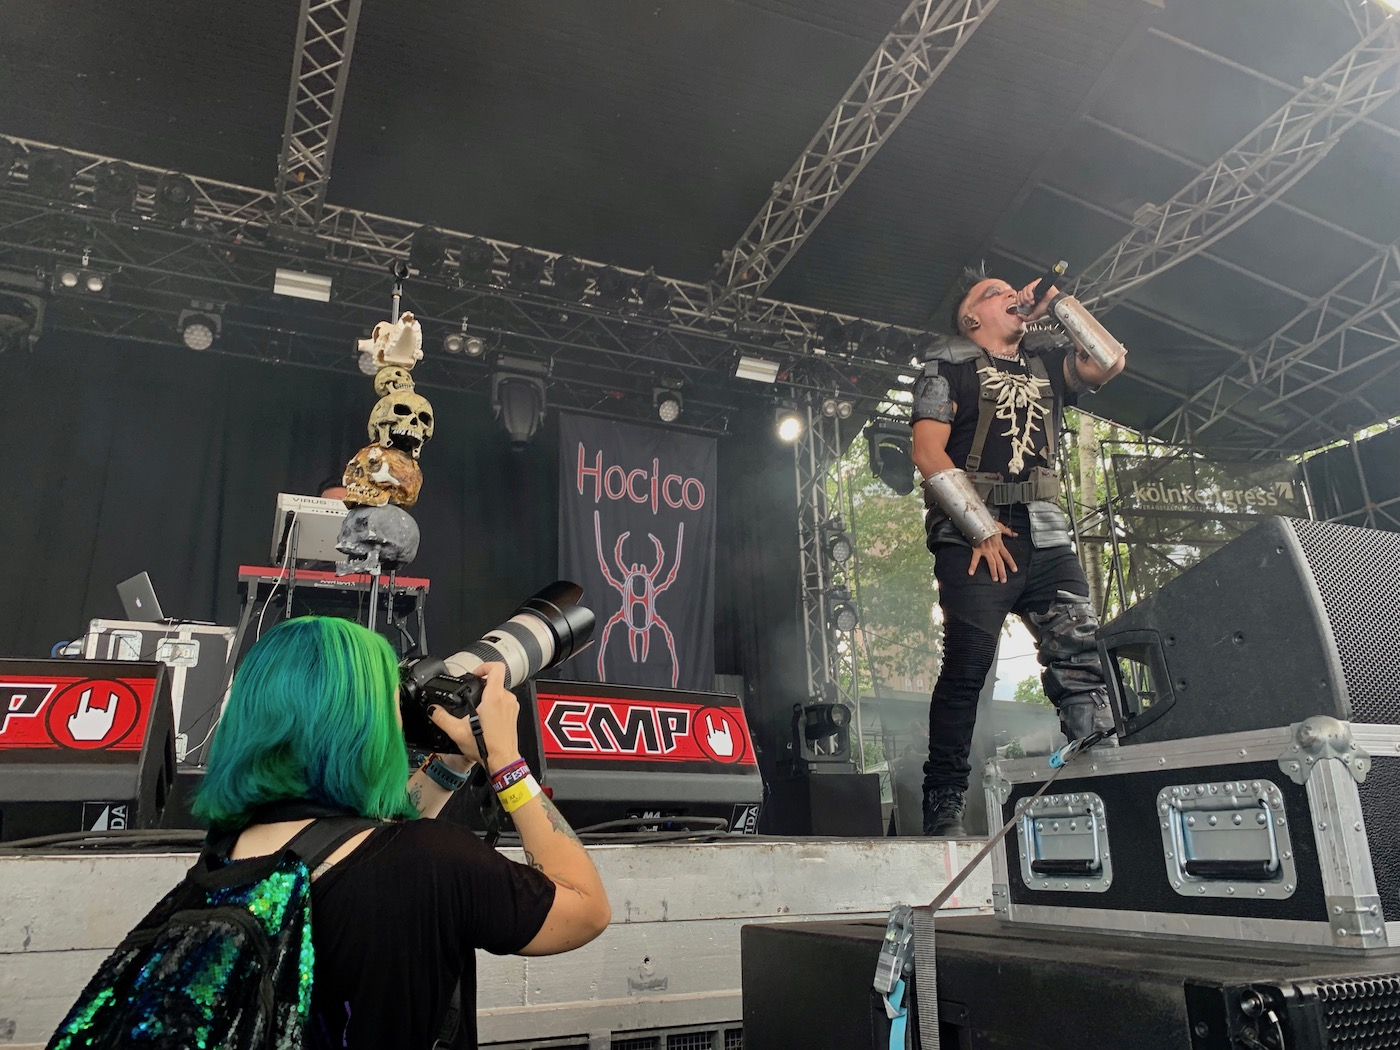 mark_benecke_amphi_festival_koeln_2019 - 47.jpg